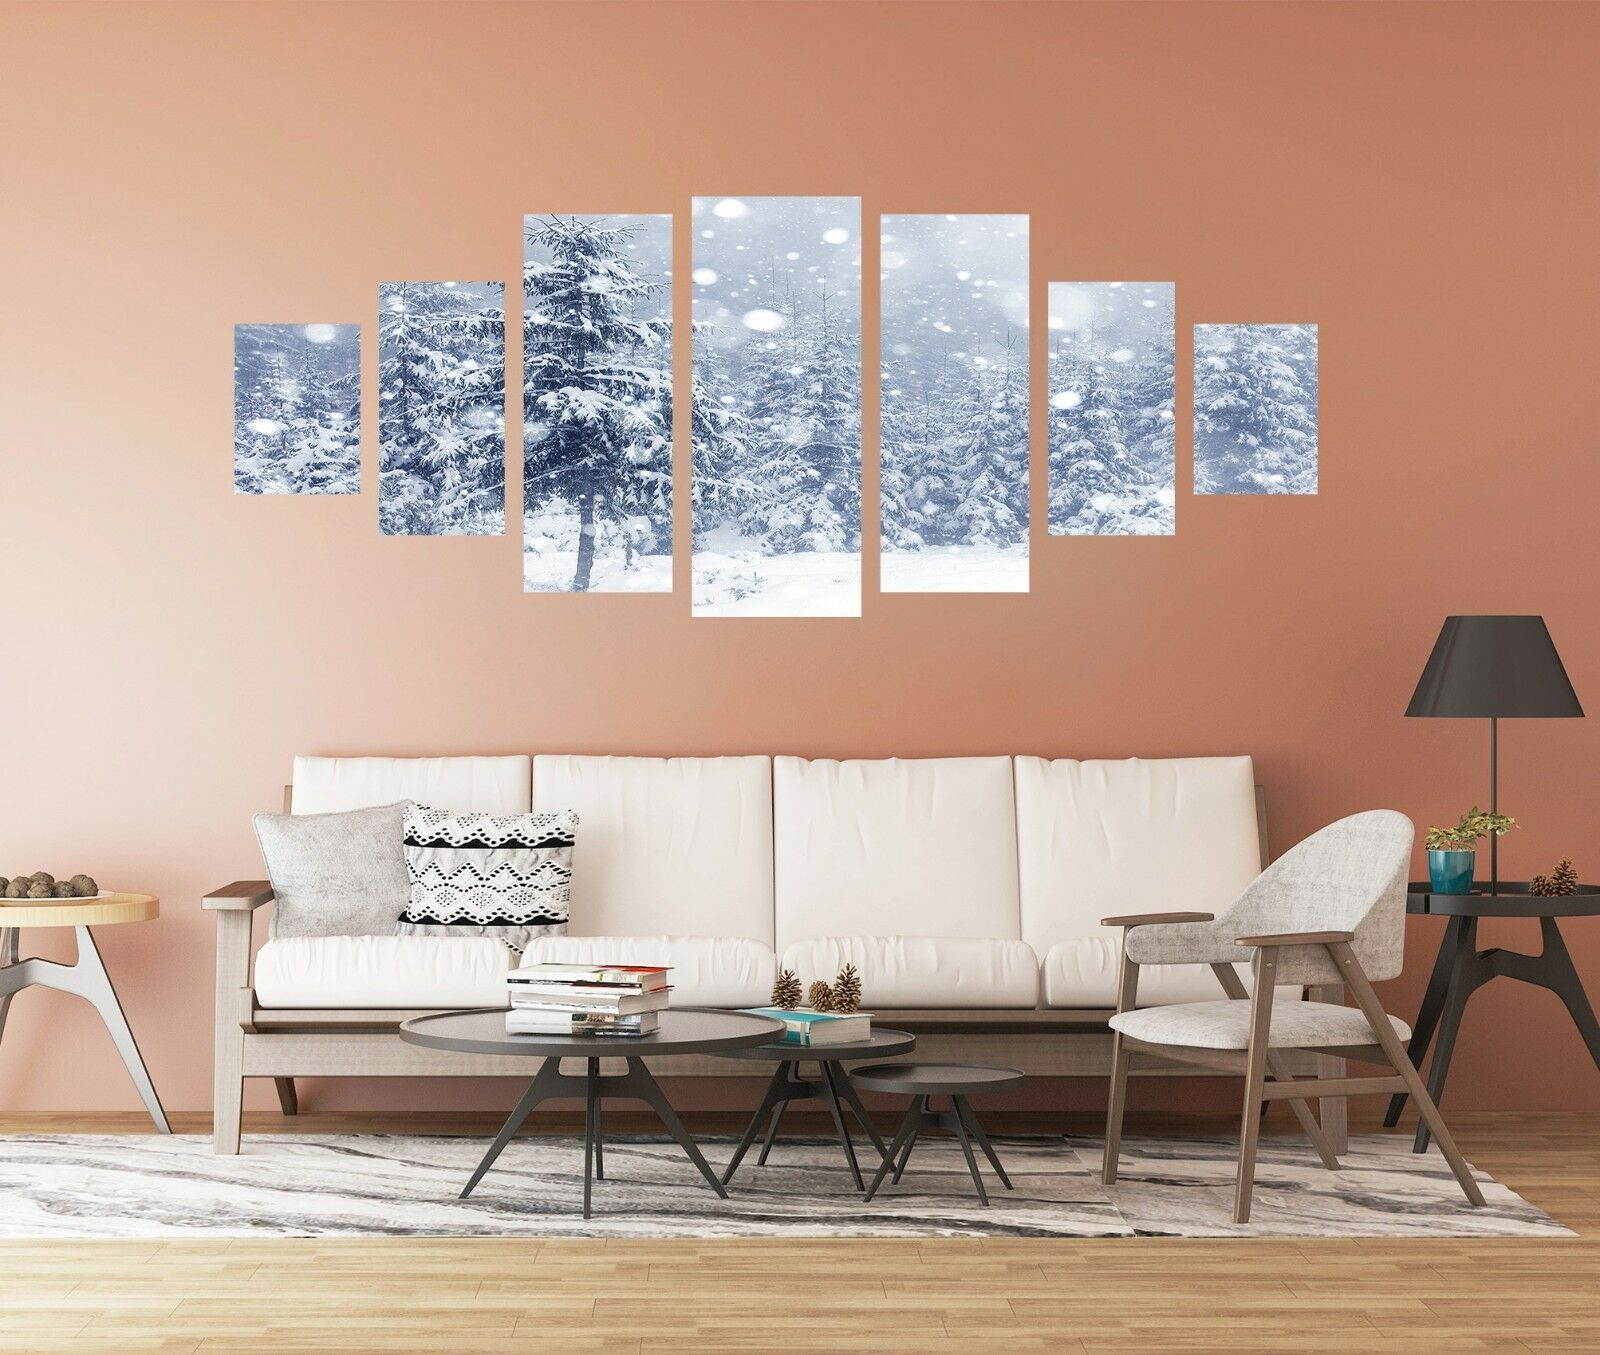 3D Snowing Road 72 Unframed Print Wall Paper Decal Wall Deco Indoor AJ Jenny